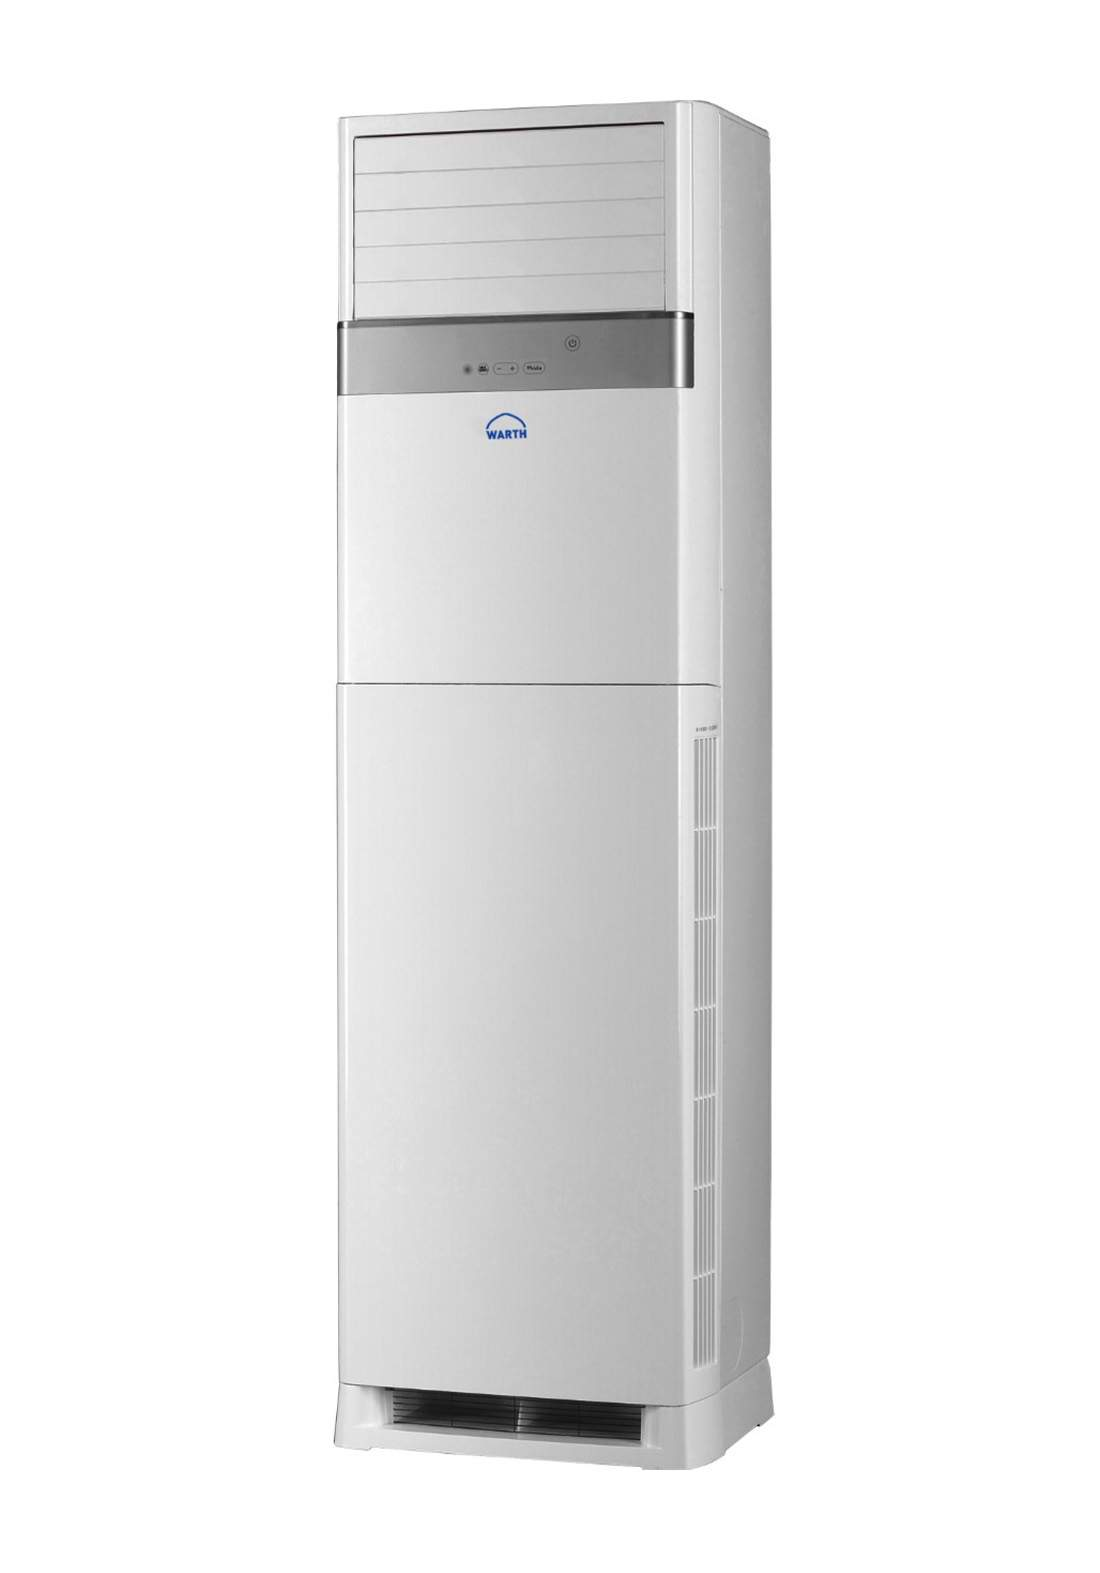 Warth WFS-36-H -T3 Floor Standing Air Conditioner  سبلت عامودي 3 طن